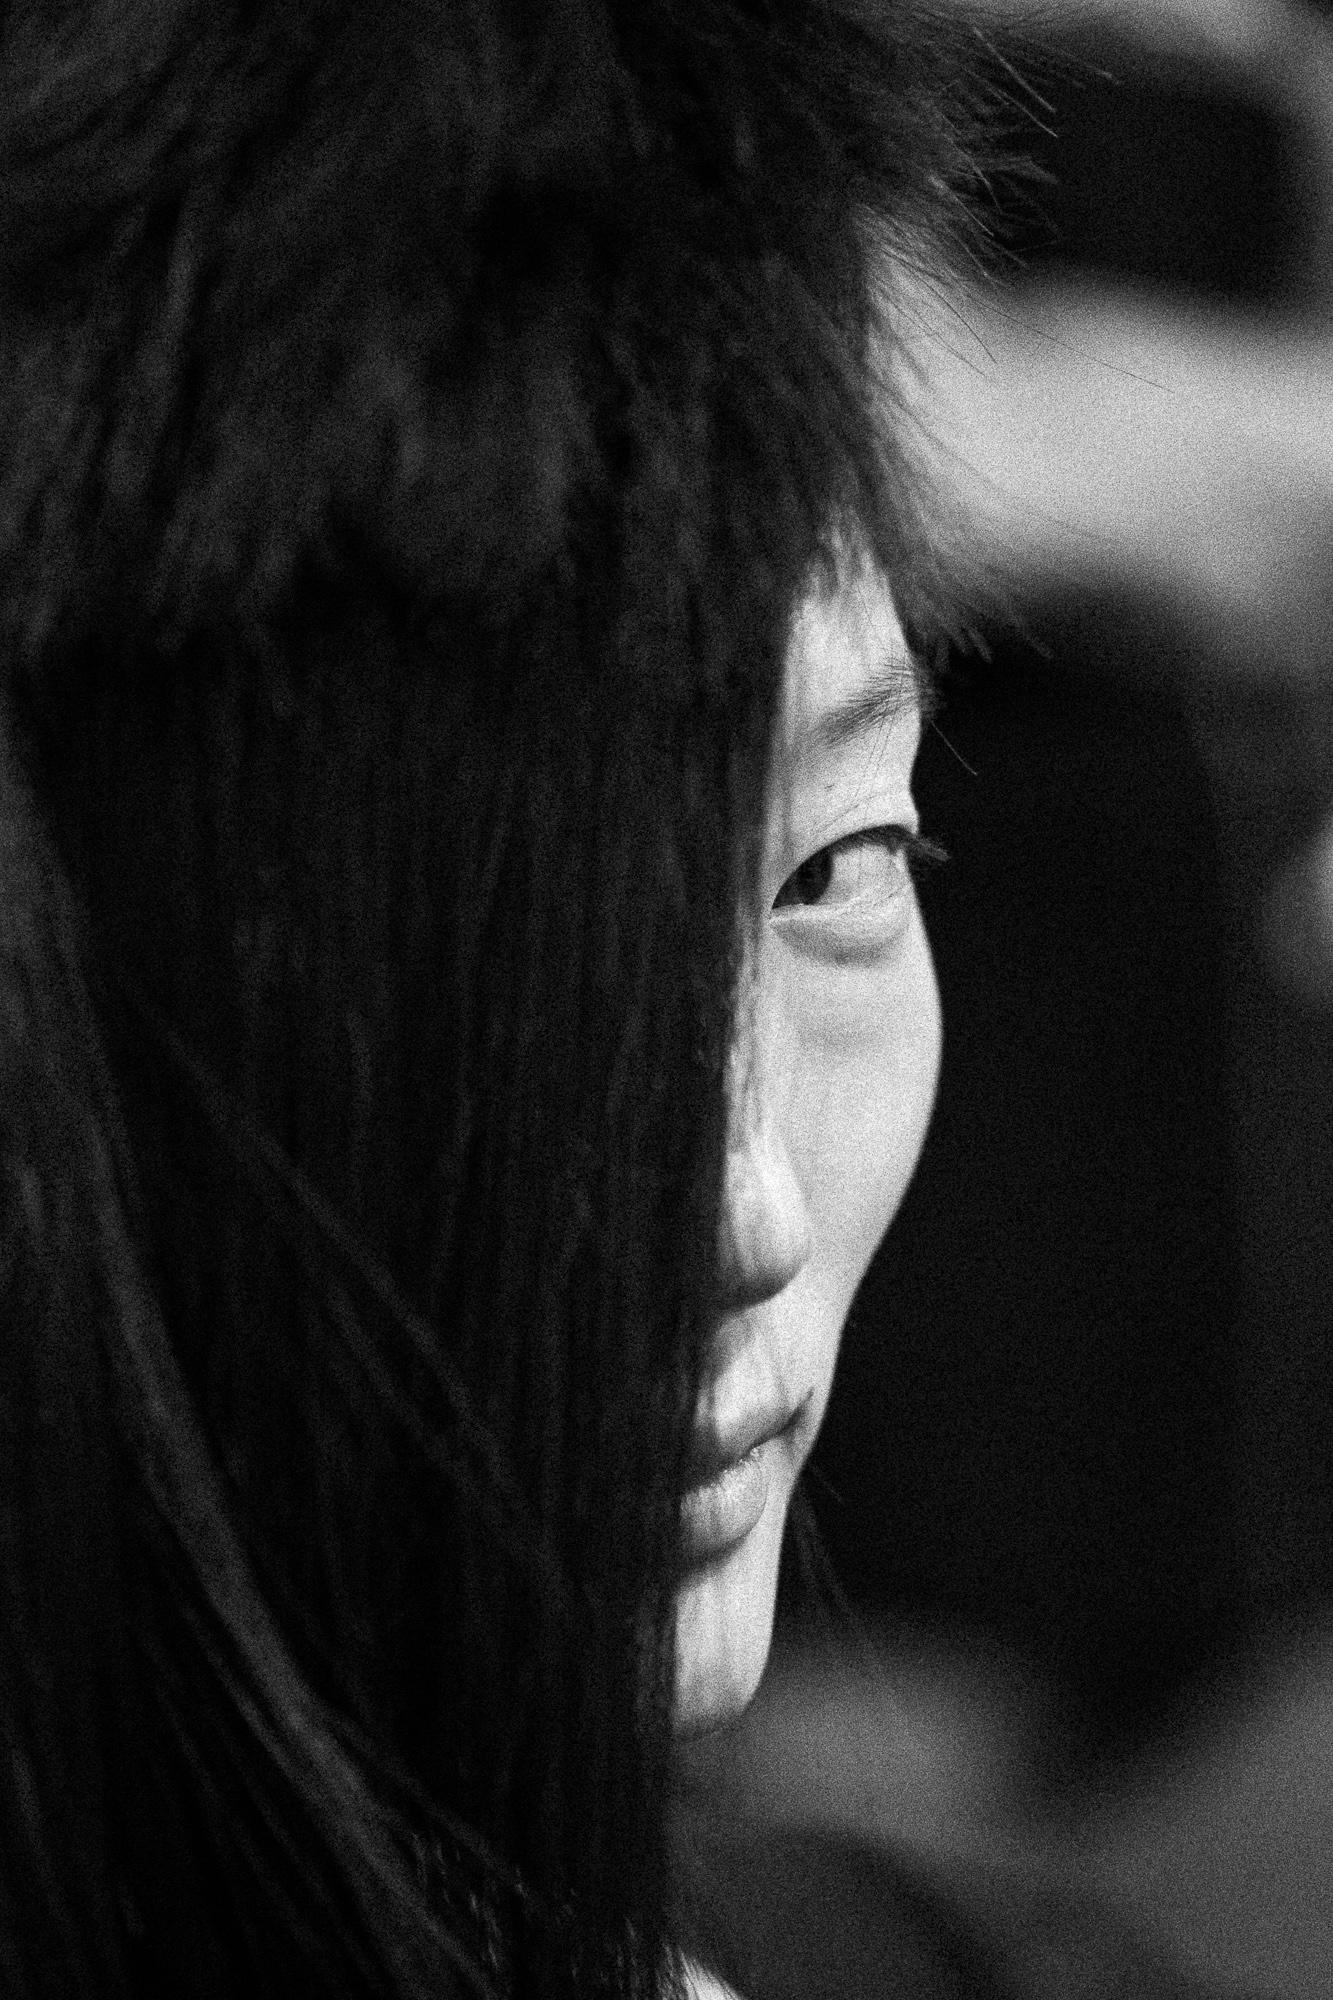 oscar-arribas-beauty-backstage-madrid-fashion-week-cibeles-photography-moda-desfile-fotografo-photographer-portrait-retrato-04__MG_5547.jpg